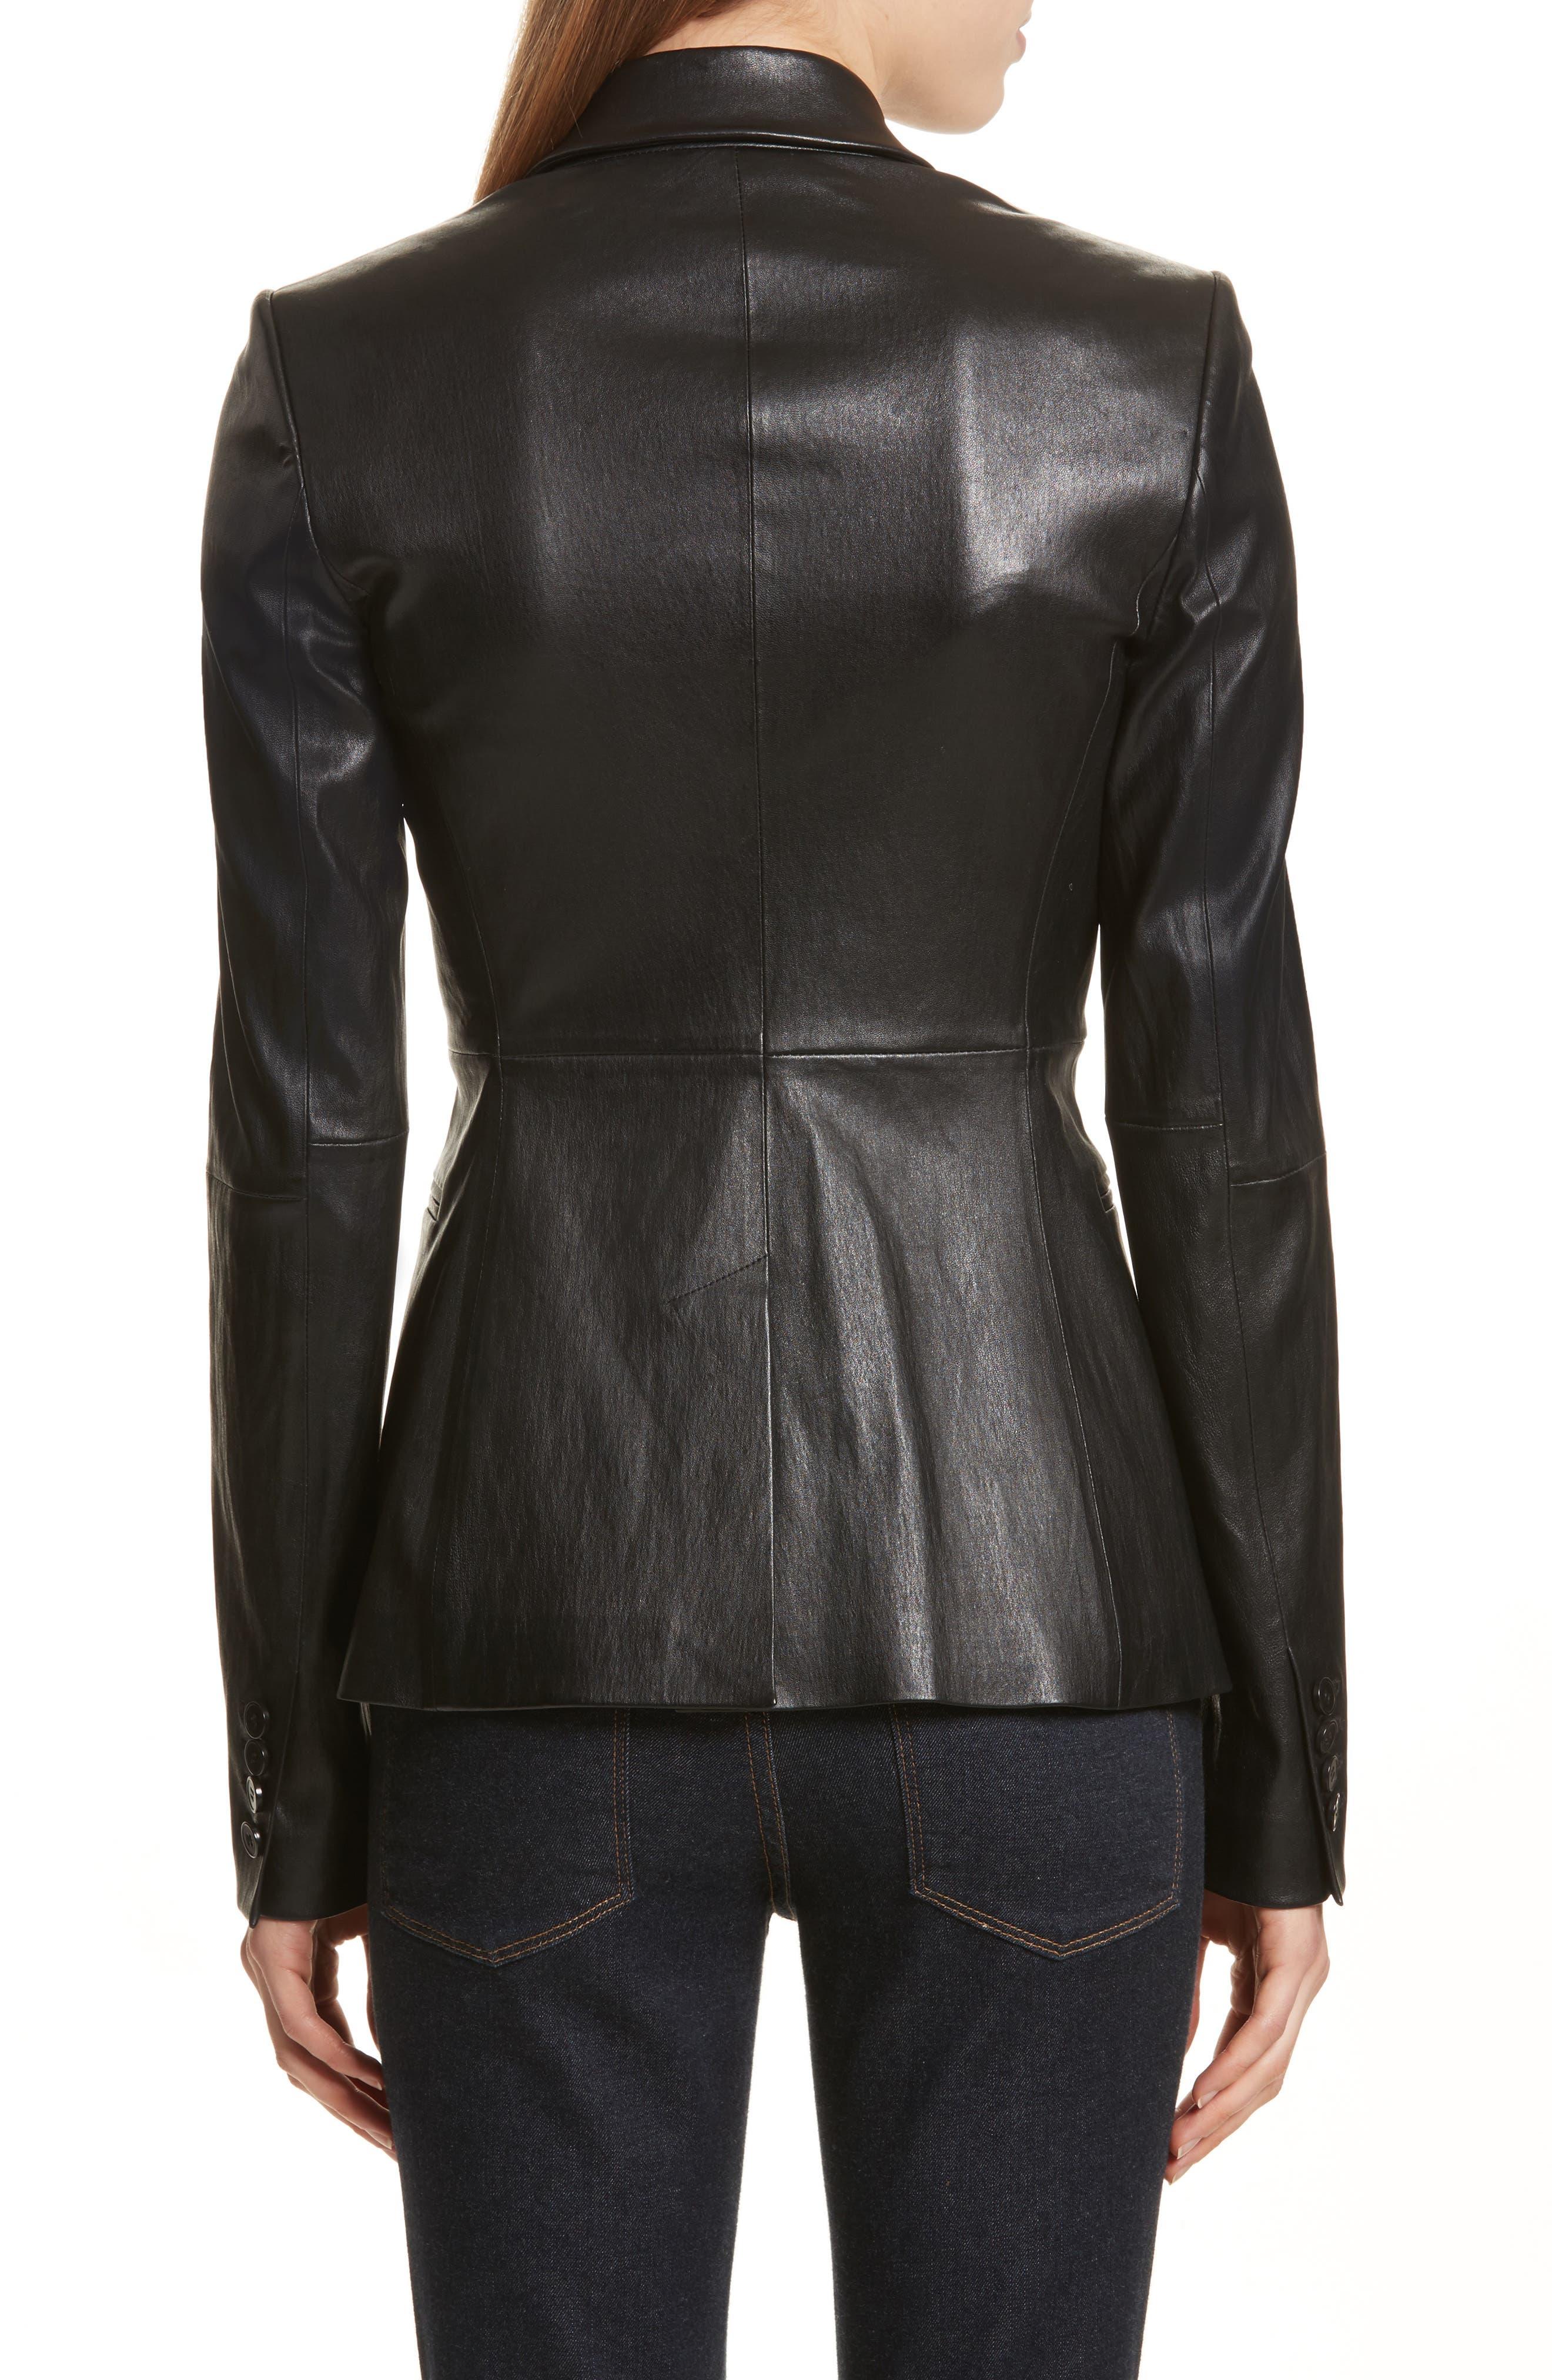 Bristol Leather Blazer,                             Alternate thumbnail 2, color,                             001